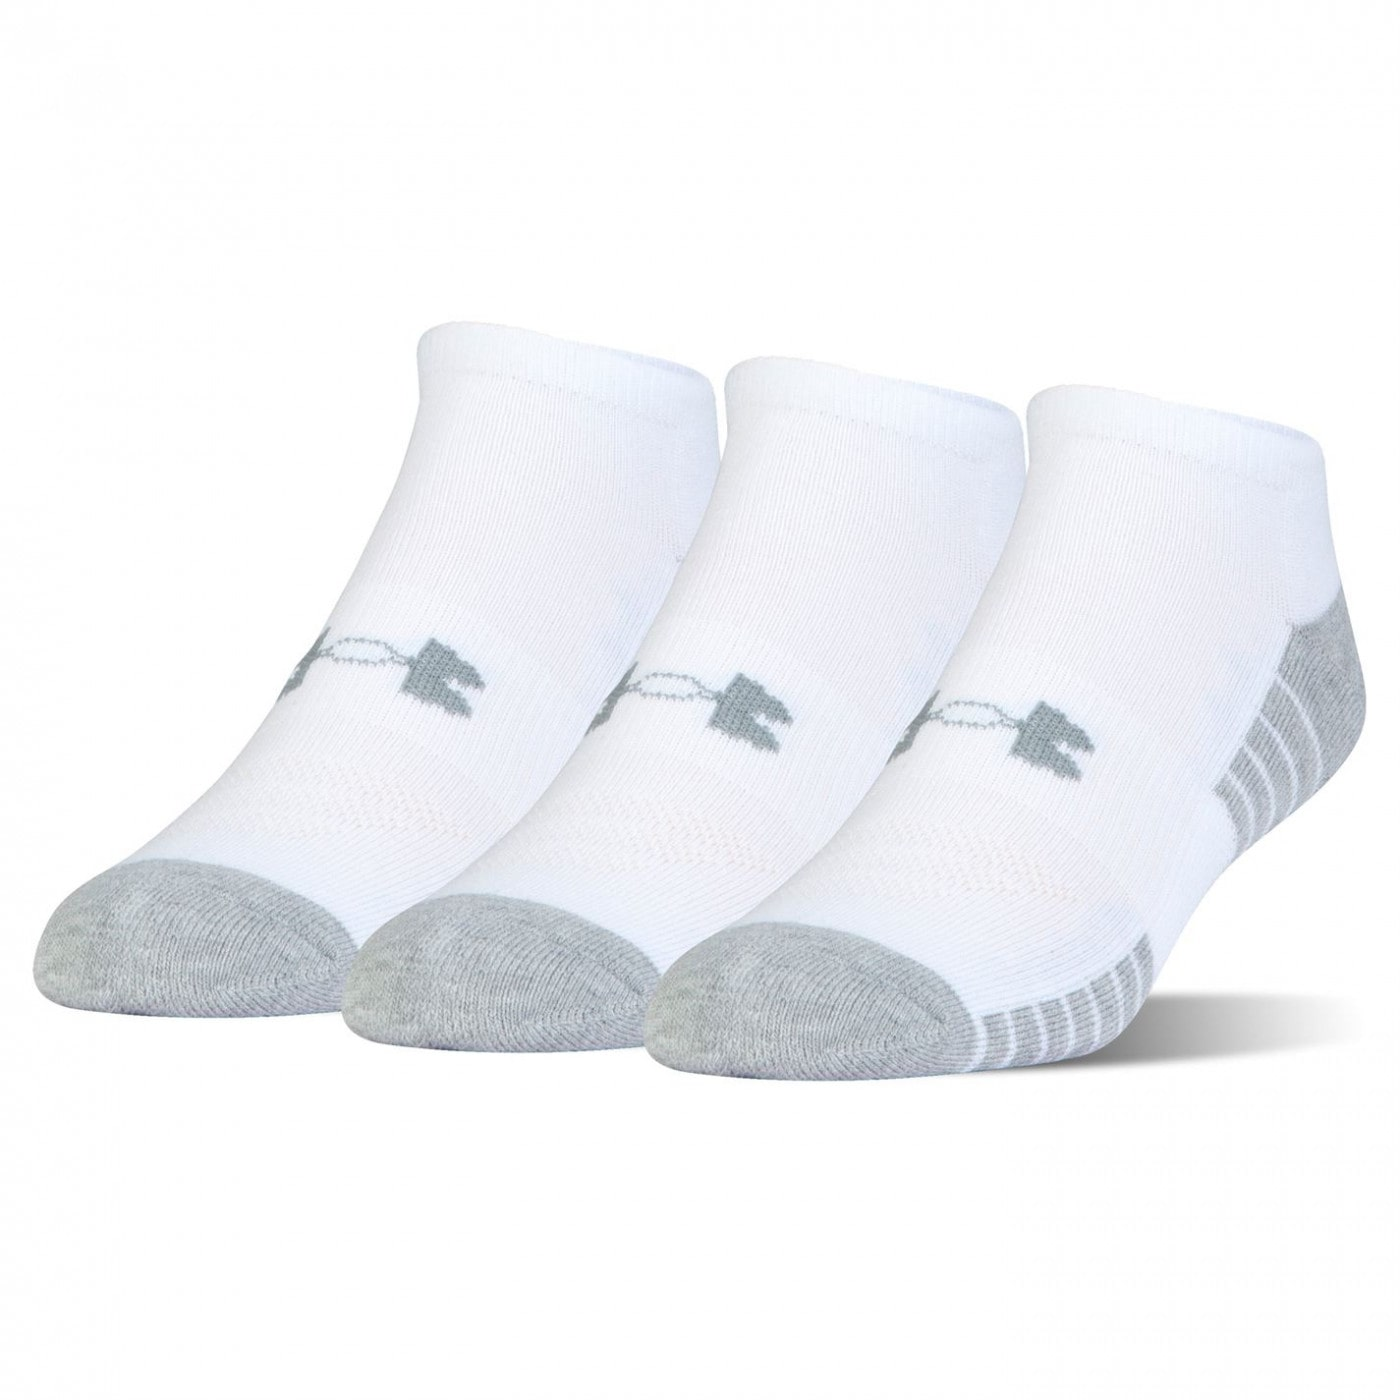 Under Armour Tech No Show 3 Pack Socks